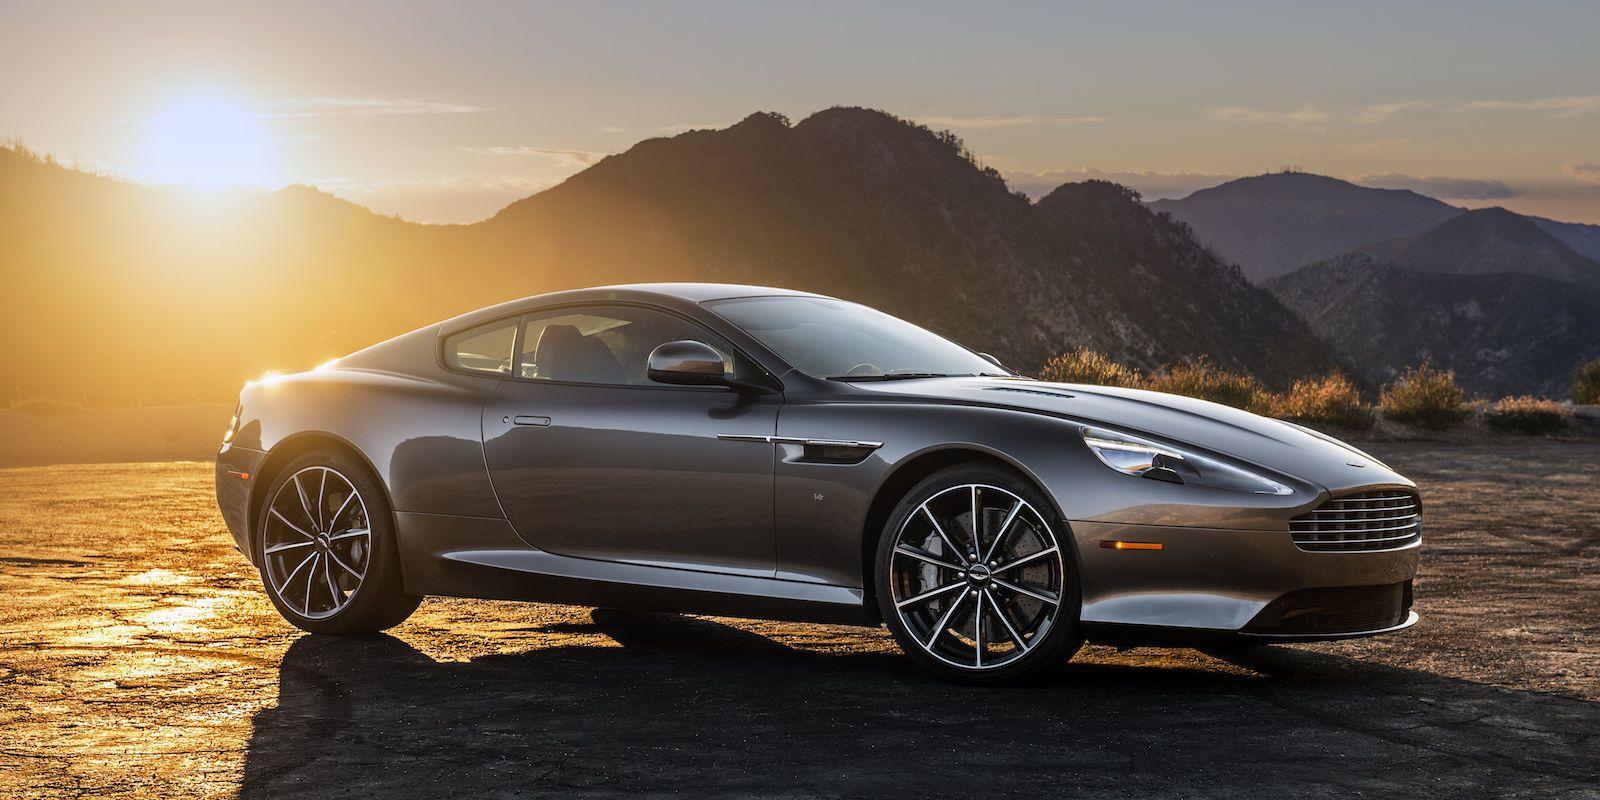 Aston Martin Db9 The Long Lived Savior Of The Brand Ends Production Aston Martin Db9 Gt Aston Martin Cars Aston Martin